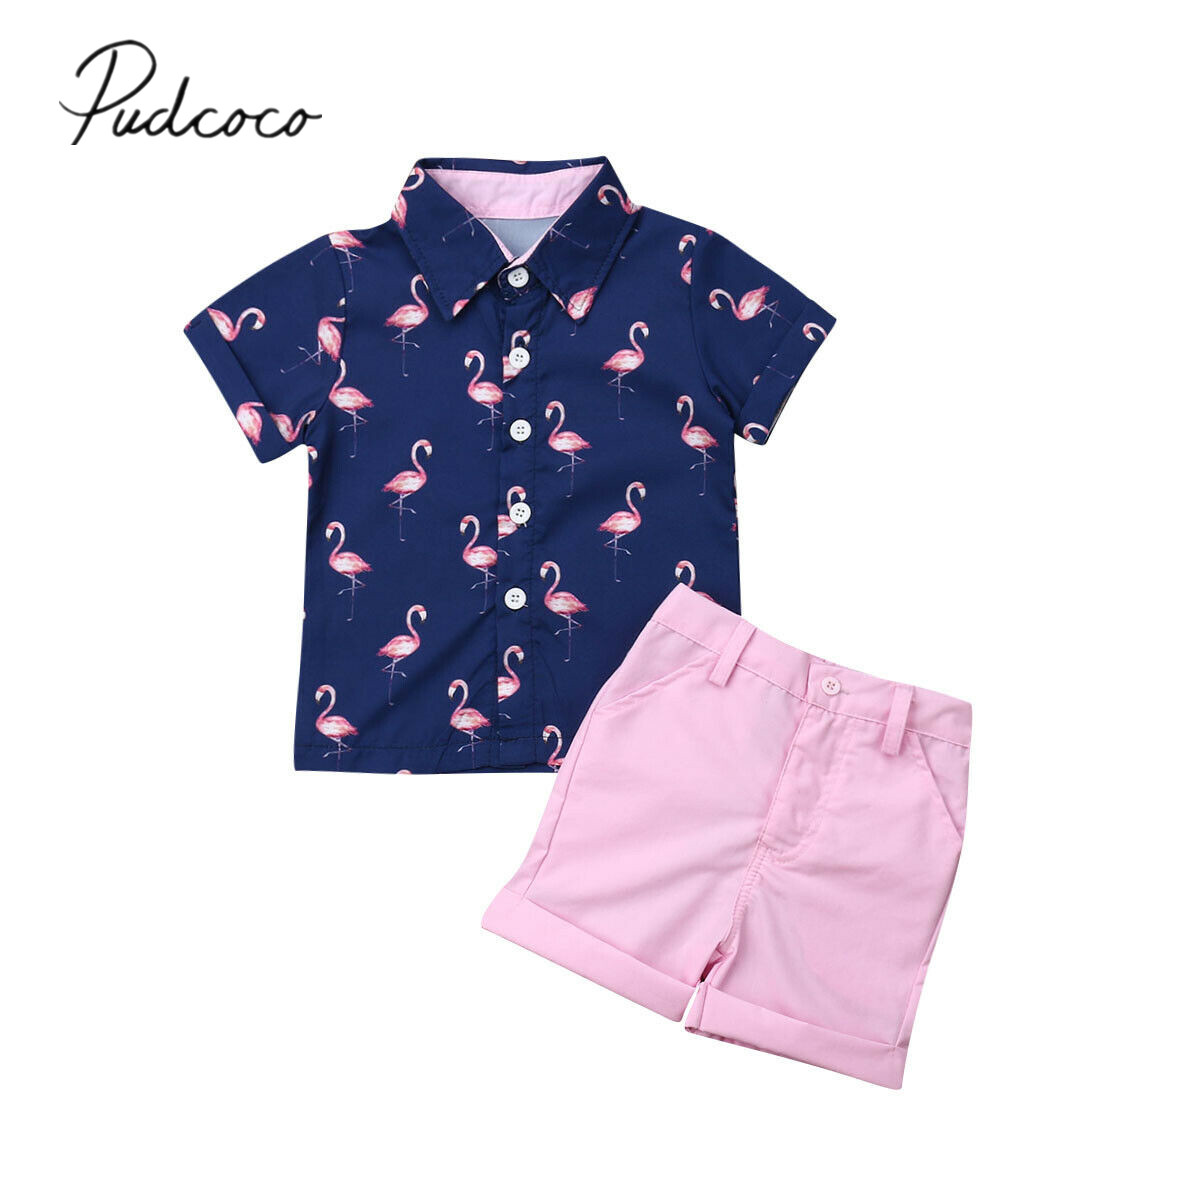 2019 Children Summer Clothing 2PCS Set Toddler Kid Baby Boy Flamingo Tops T-shirt+Shorts Pants Outfits Short Sleeve Clothes 1-6T front ensemble shirt ideas